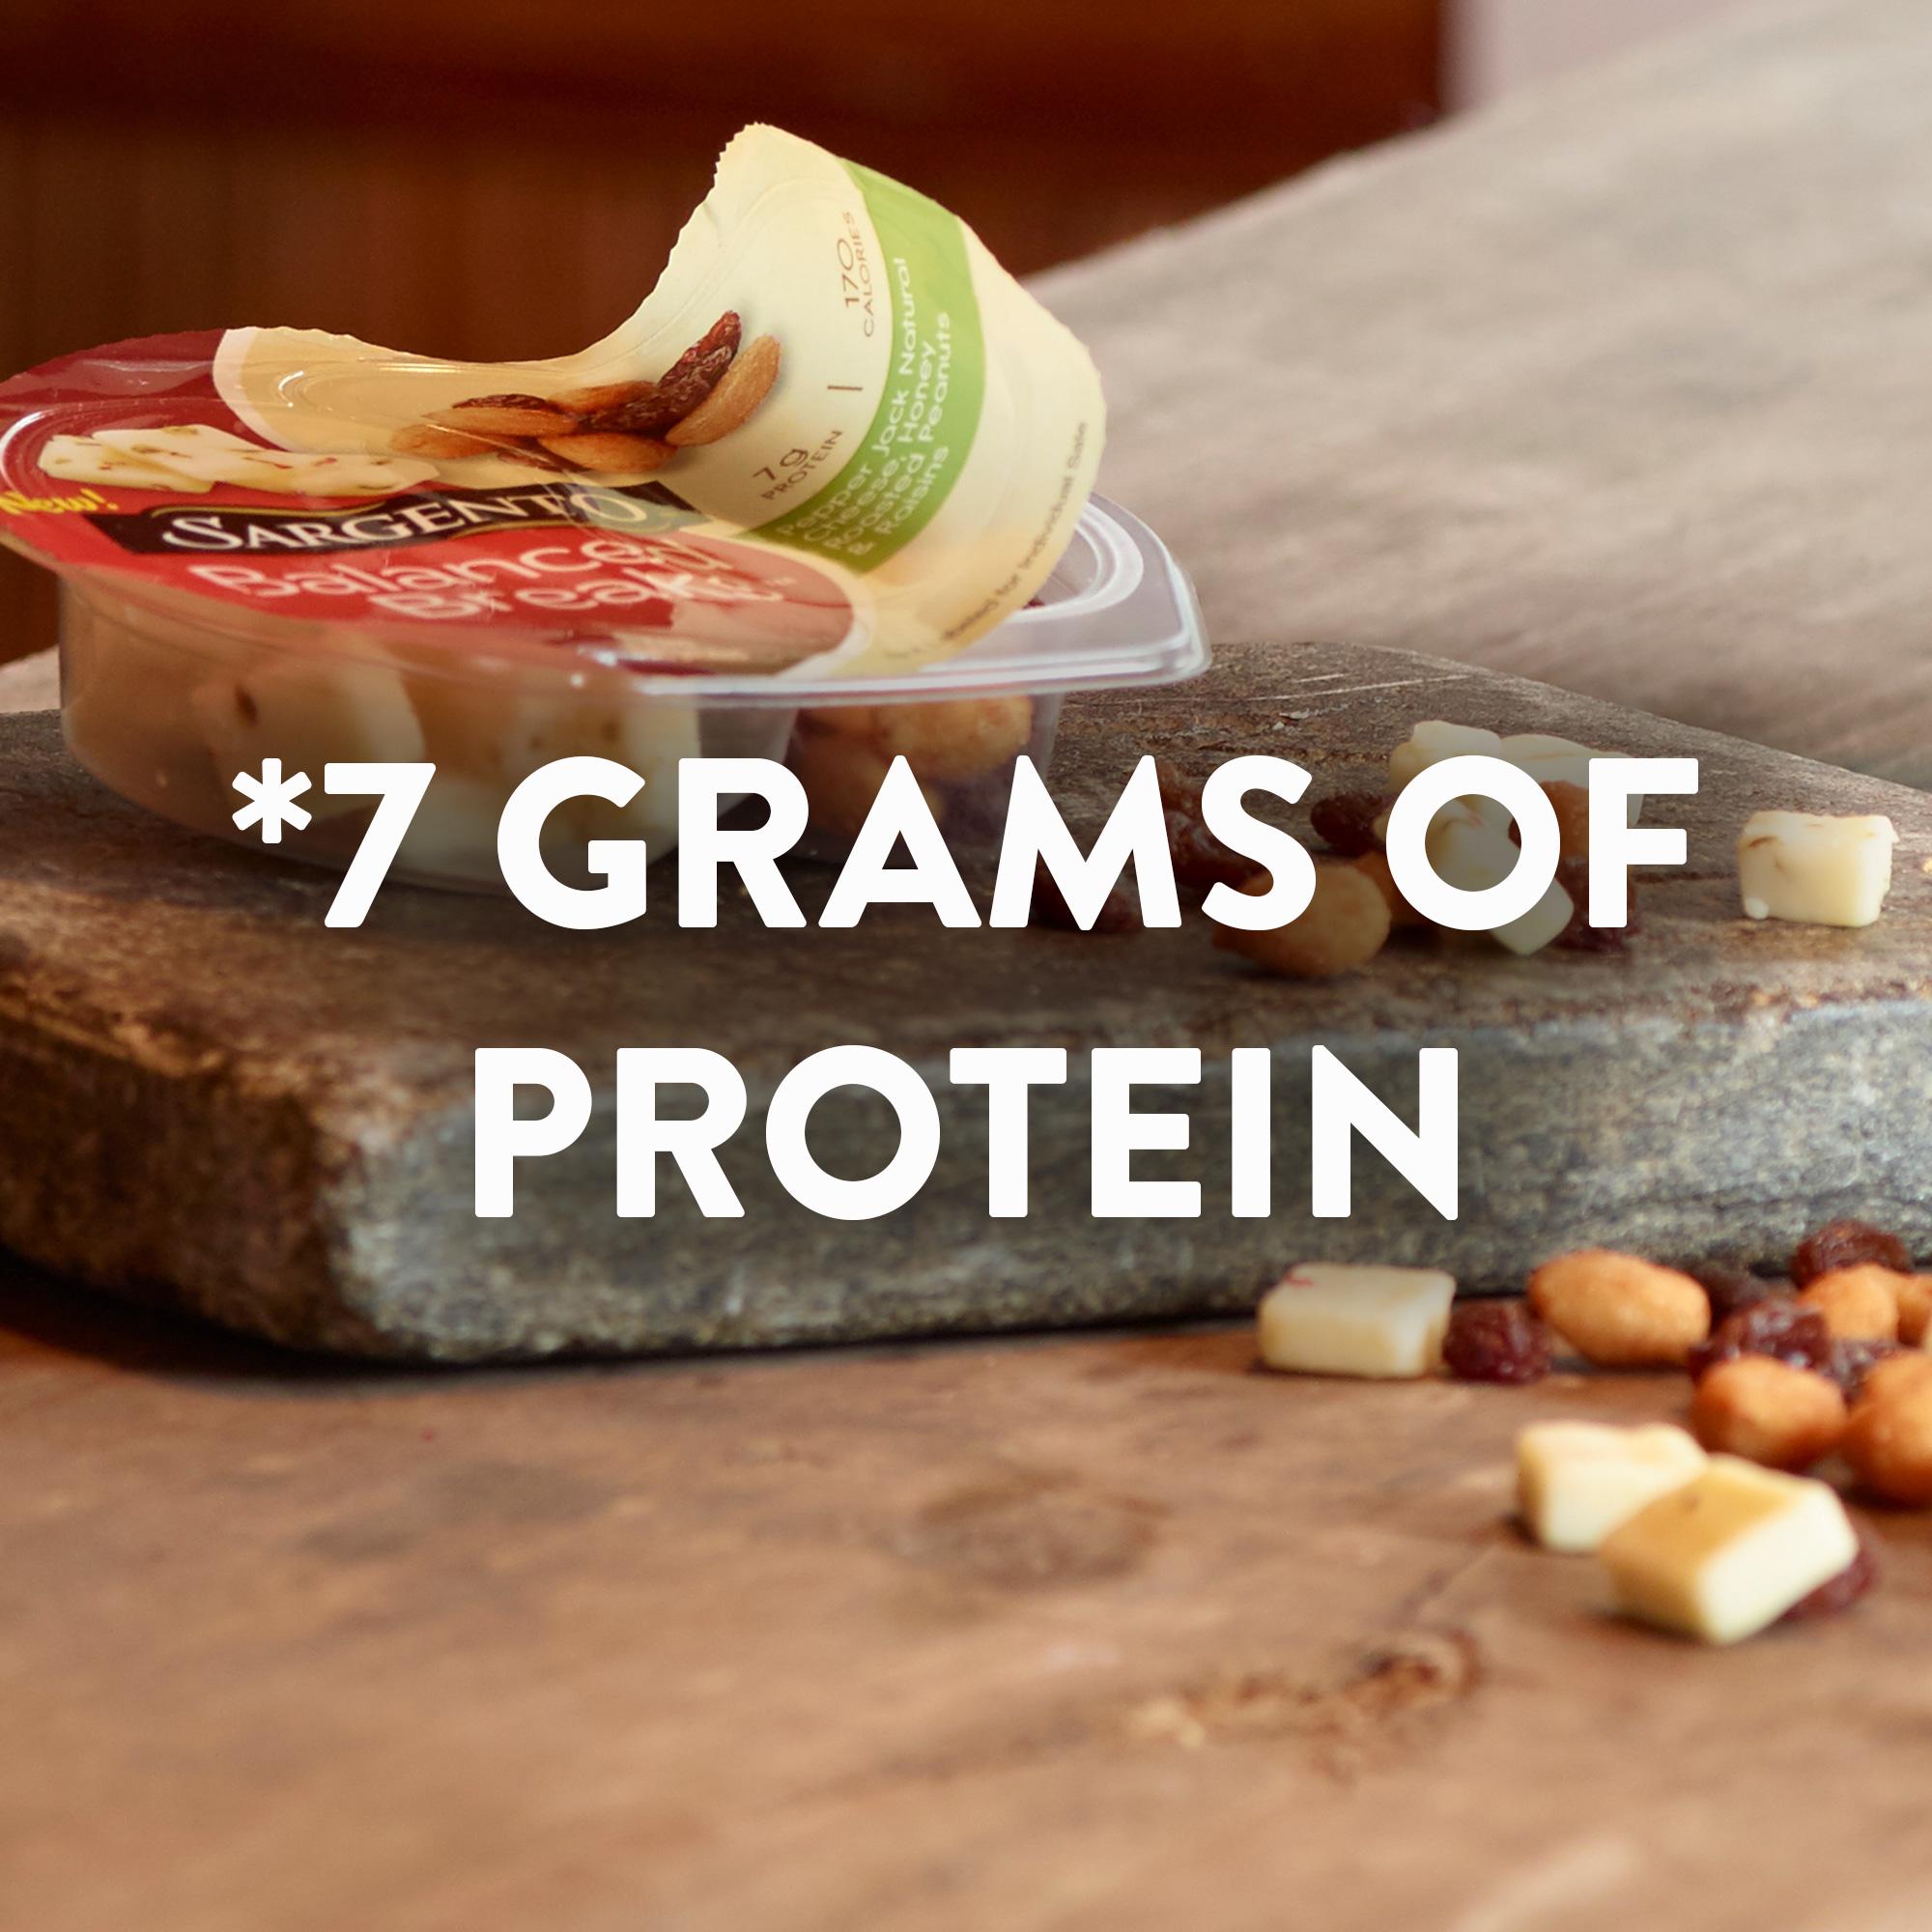 Sargento® Balanced Breaks®, Pepper Jack Natural Cheese, Honey Roasted Peanuts and Raisins